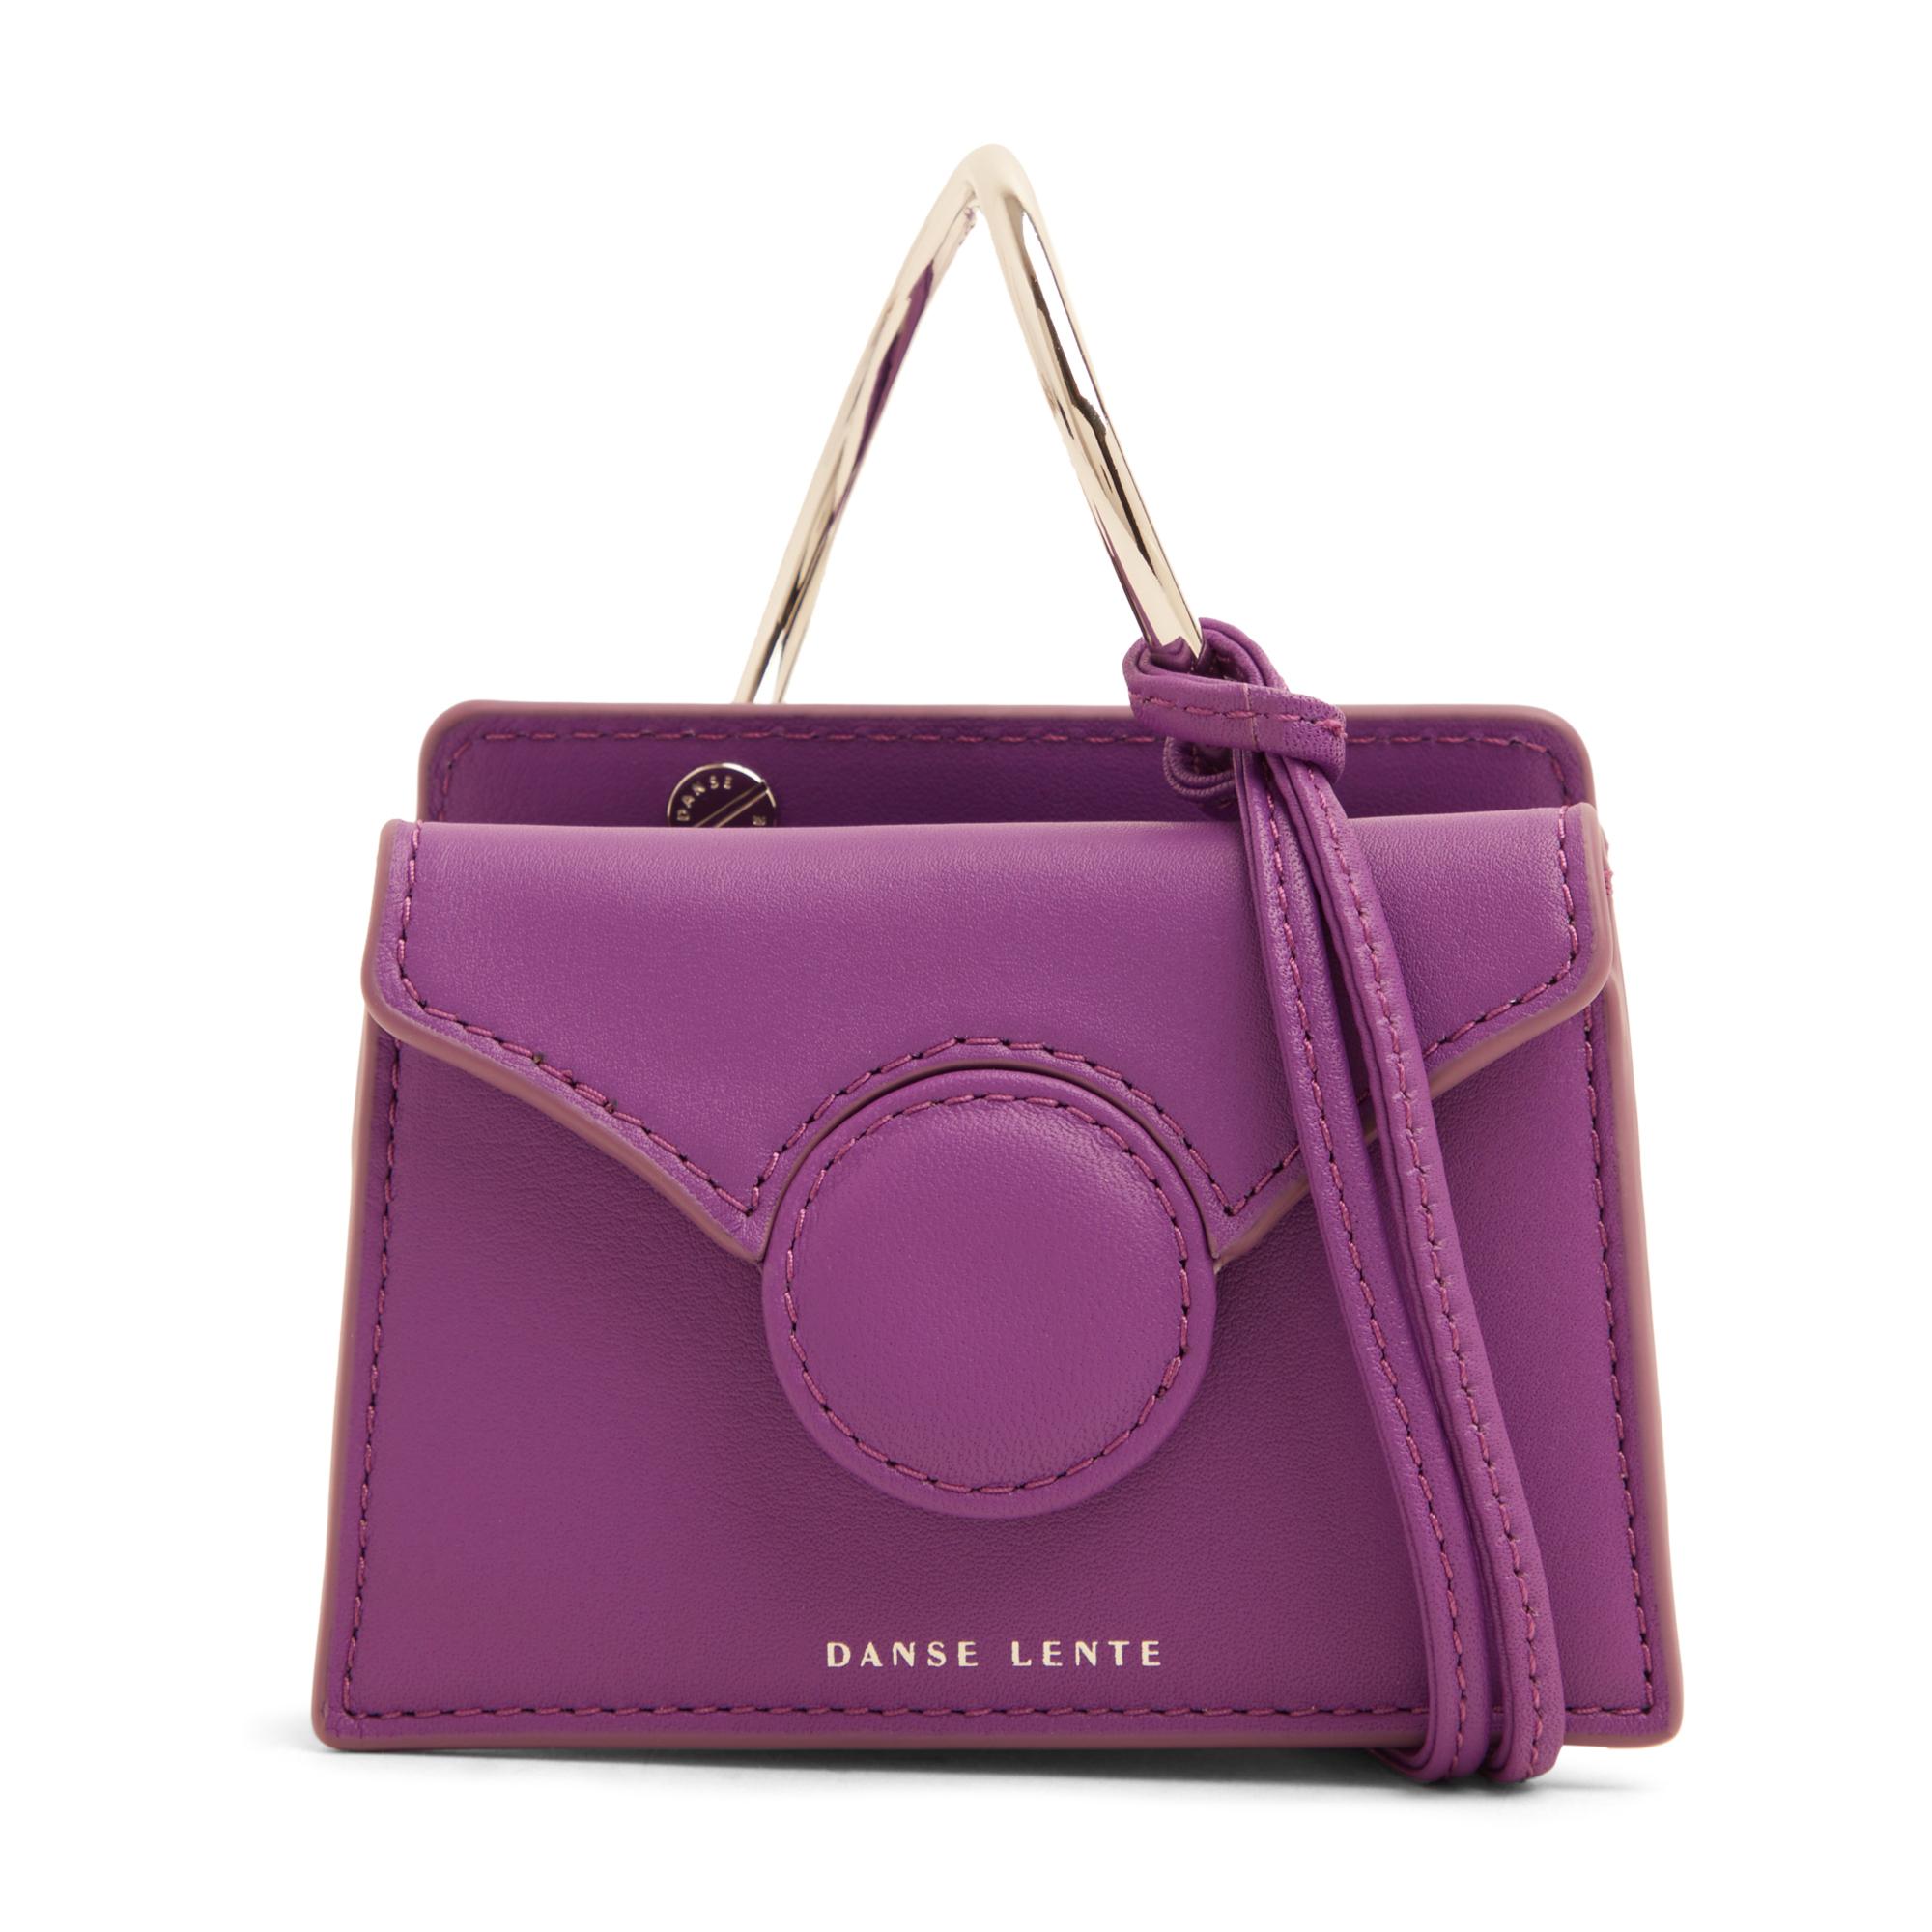 Micro Phoebe crossbody bag